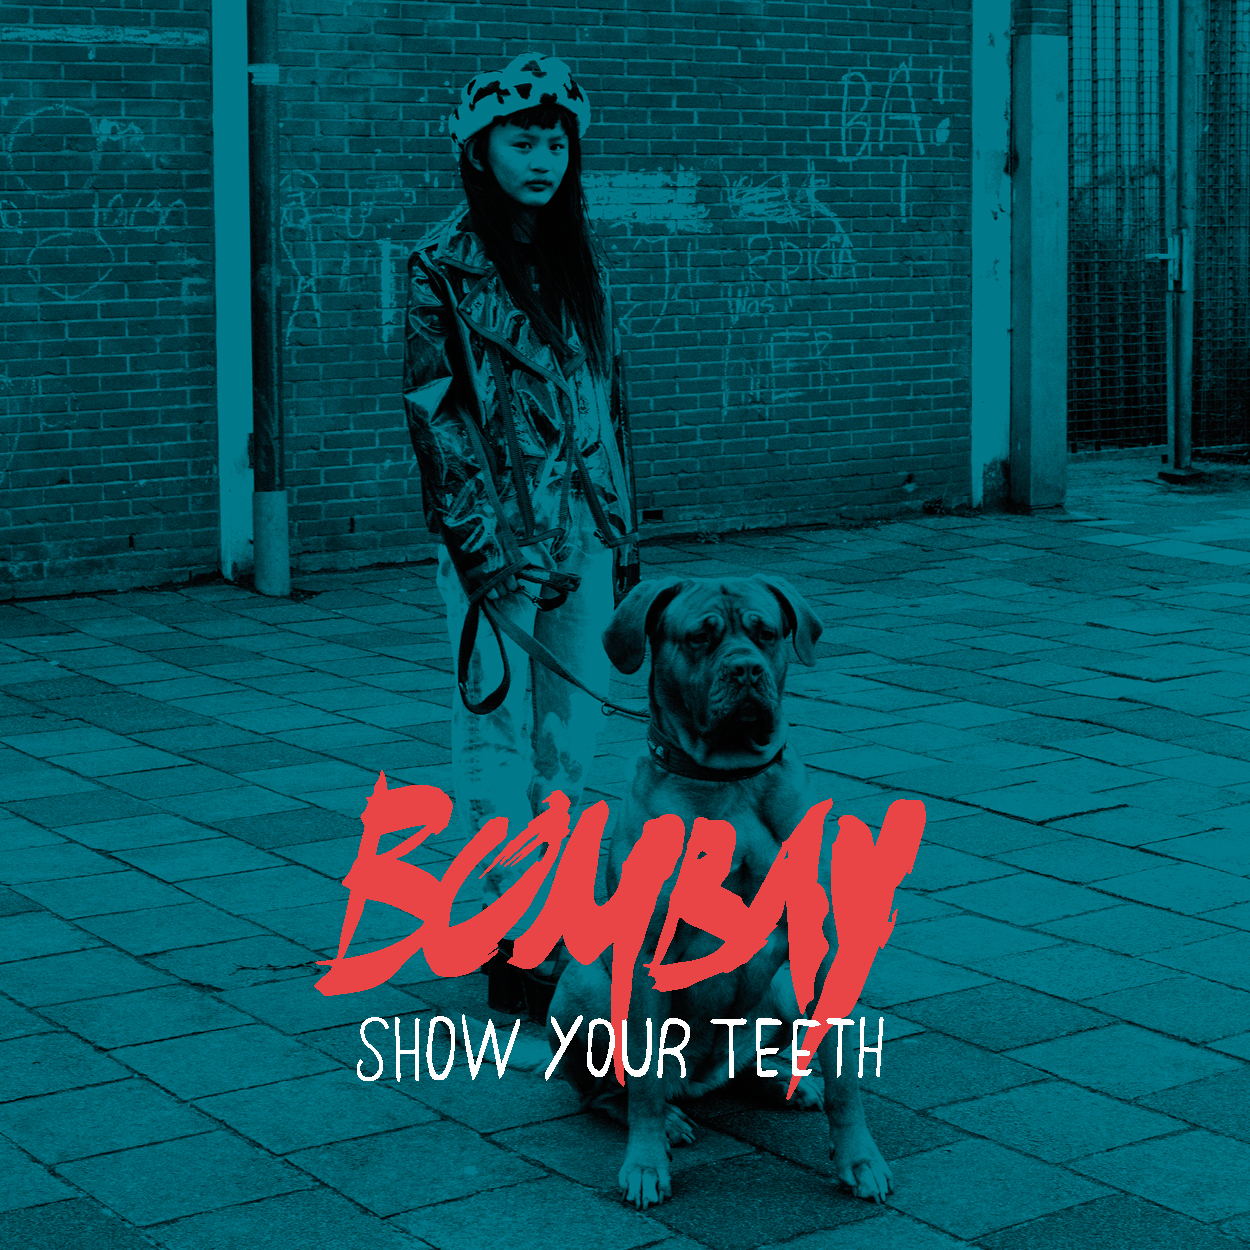 Show Your Teeth